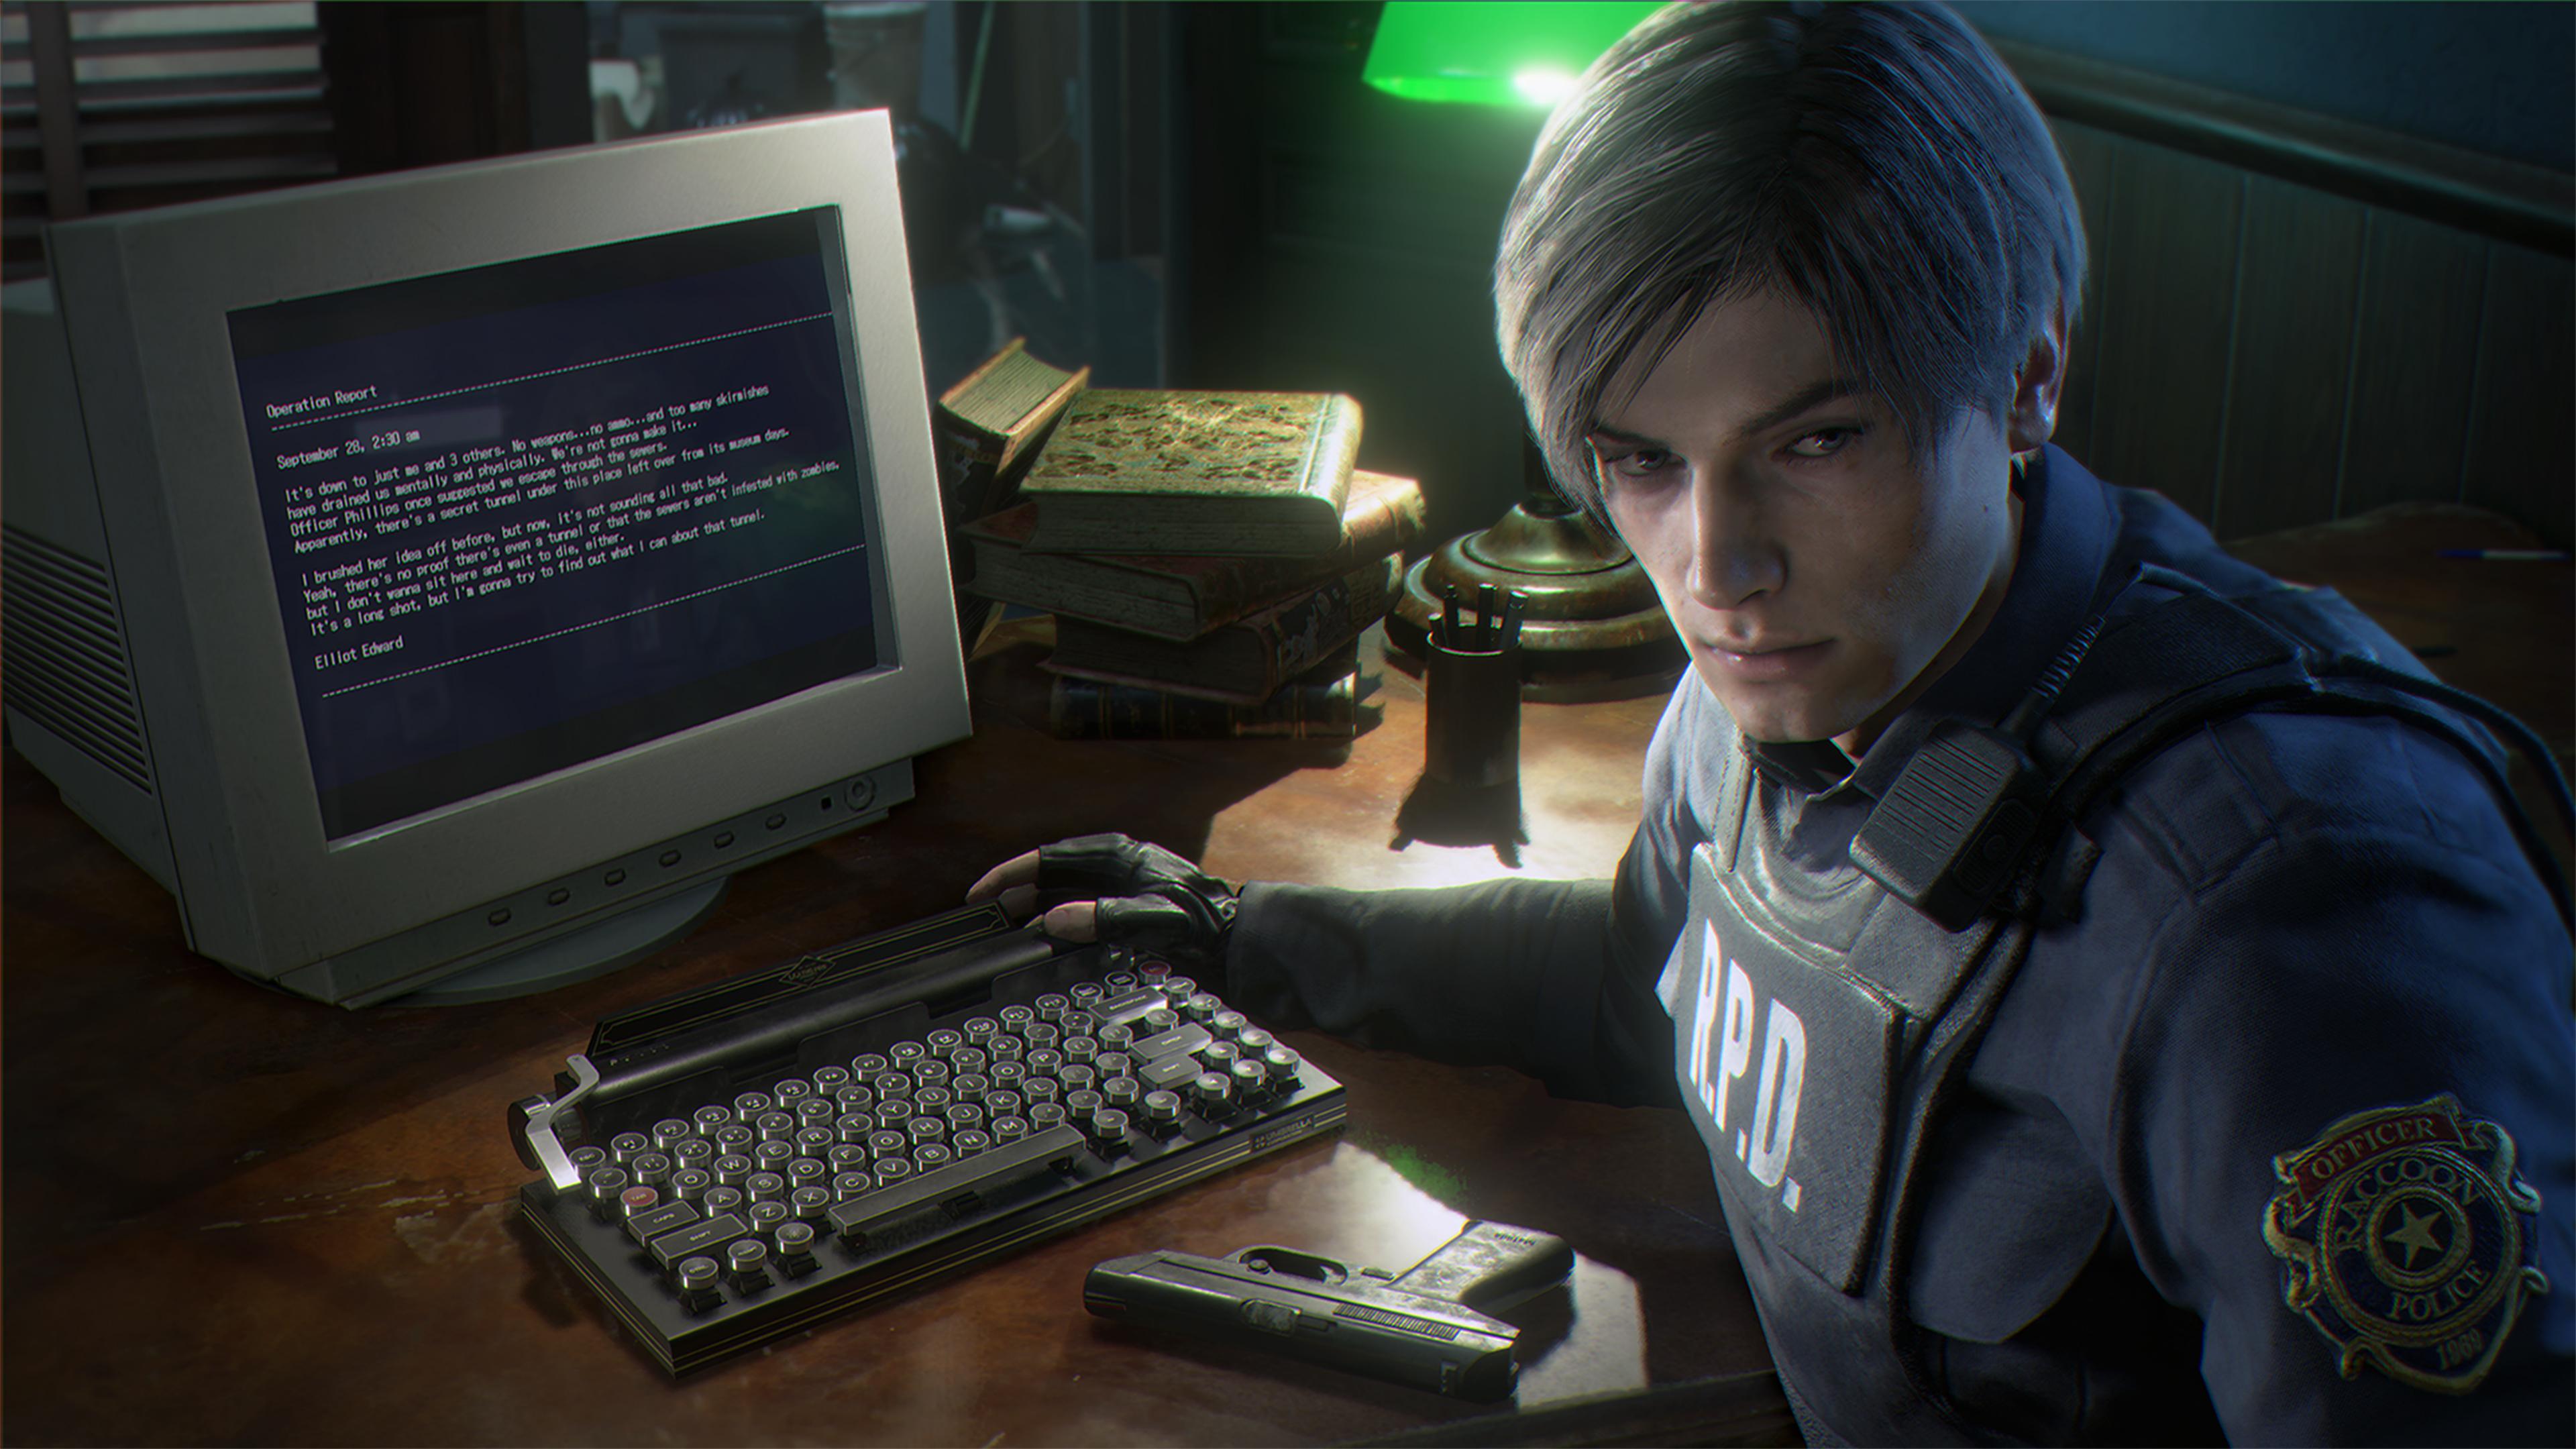 10 4k Hd Resident Evil 2 Wallpapers For Your New Desktop Background